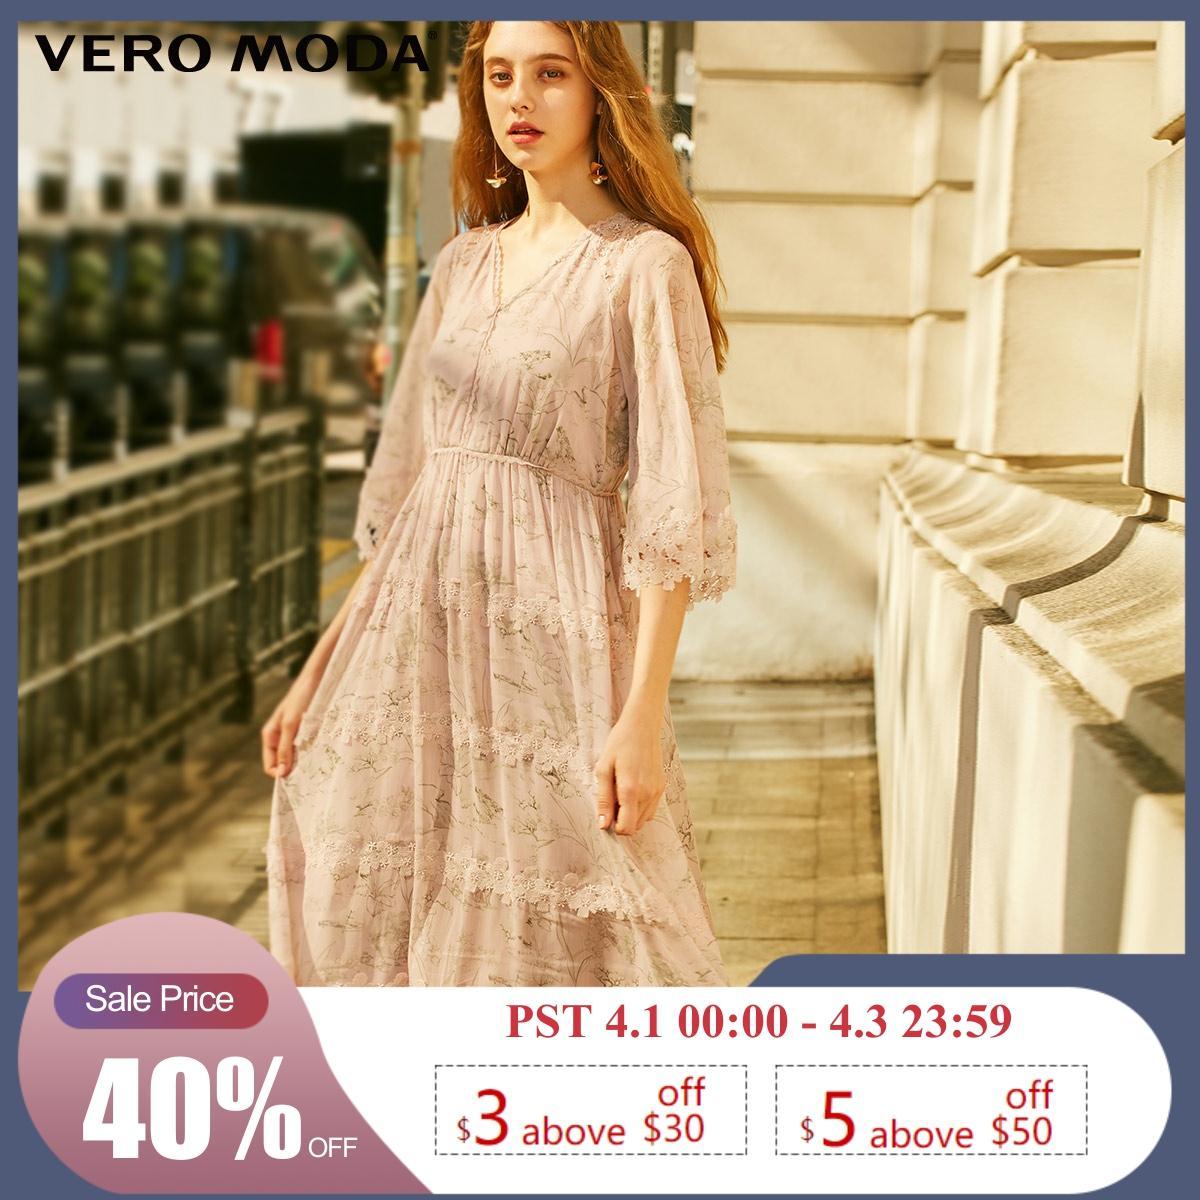 Vero Moda Women's Laced 3/4 Sleeves Printed Chiffon Dress   31917C549